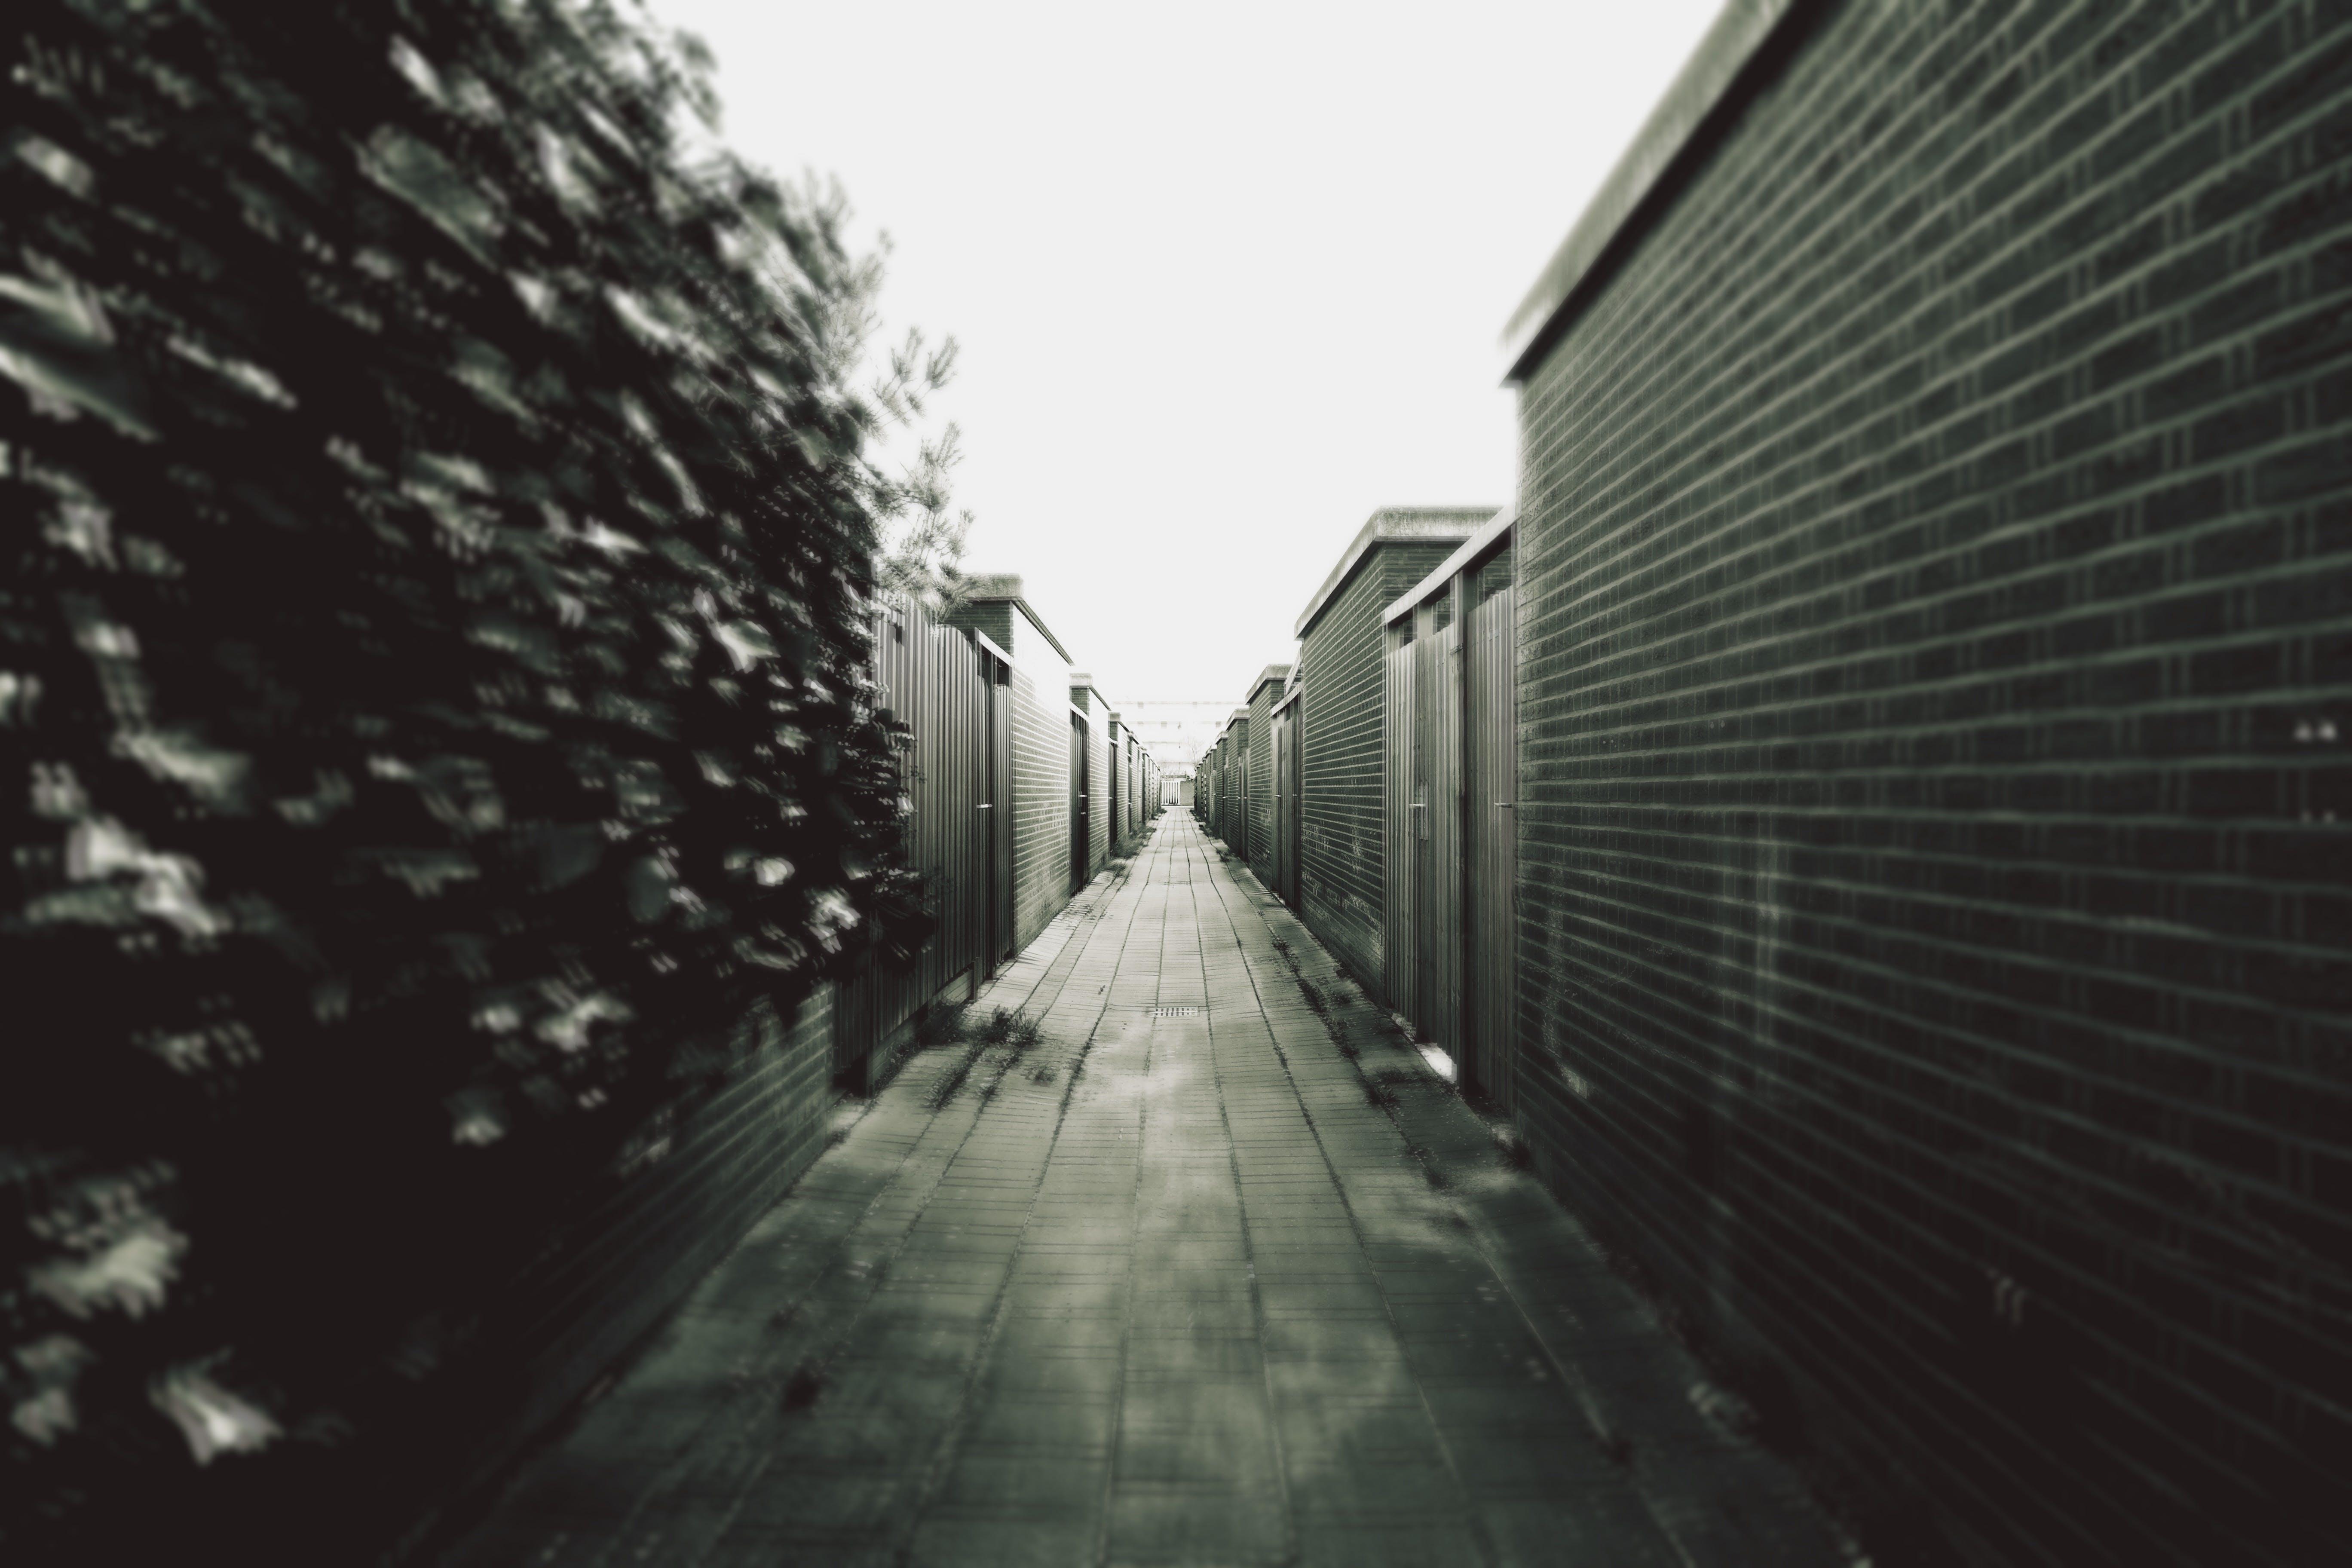 Grey Scale Photography of a Corridor